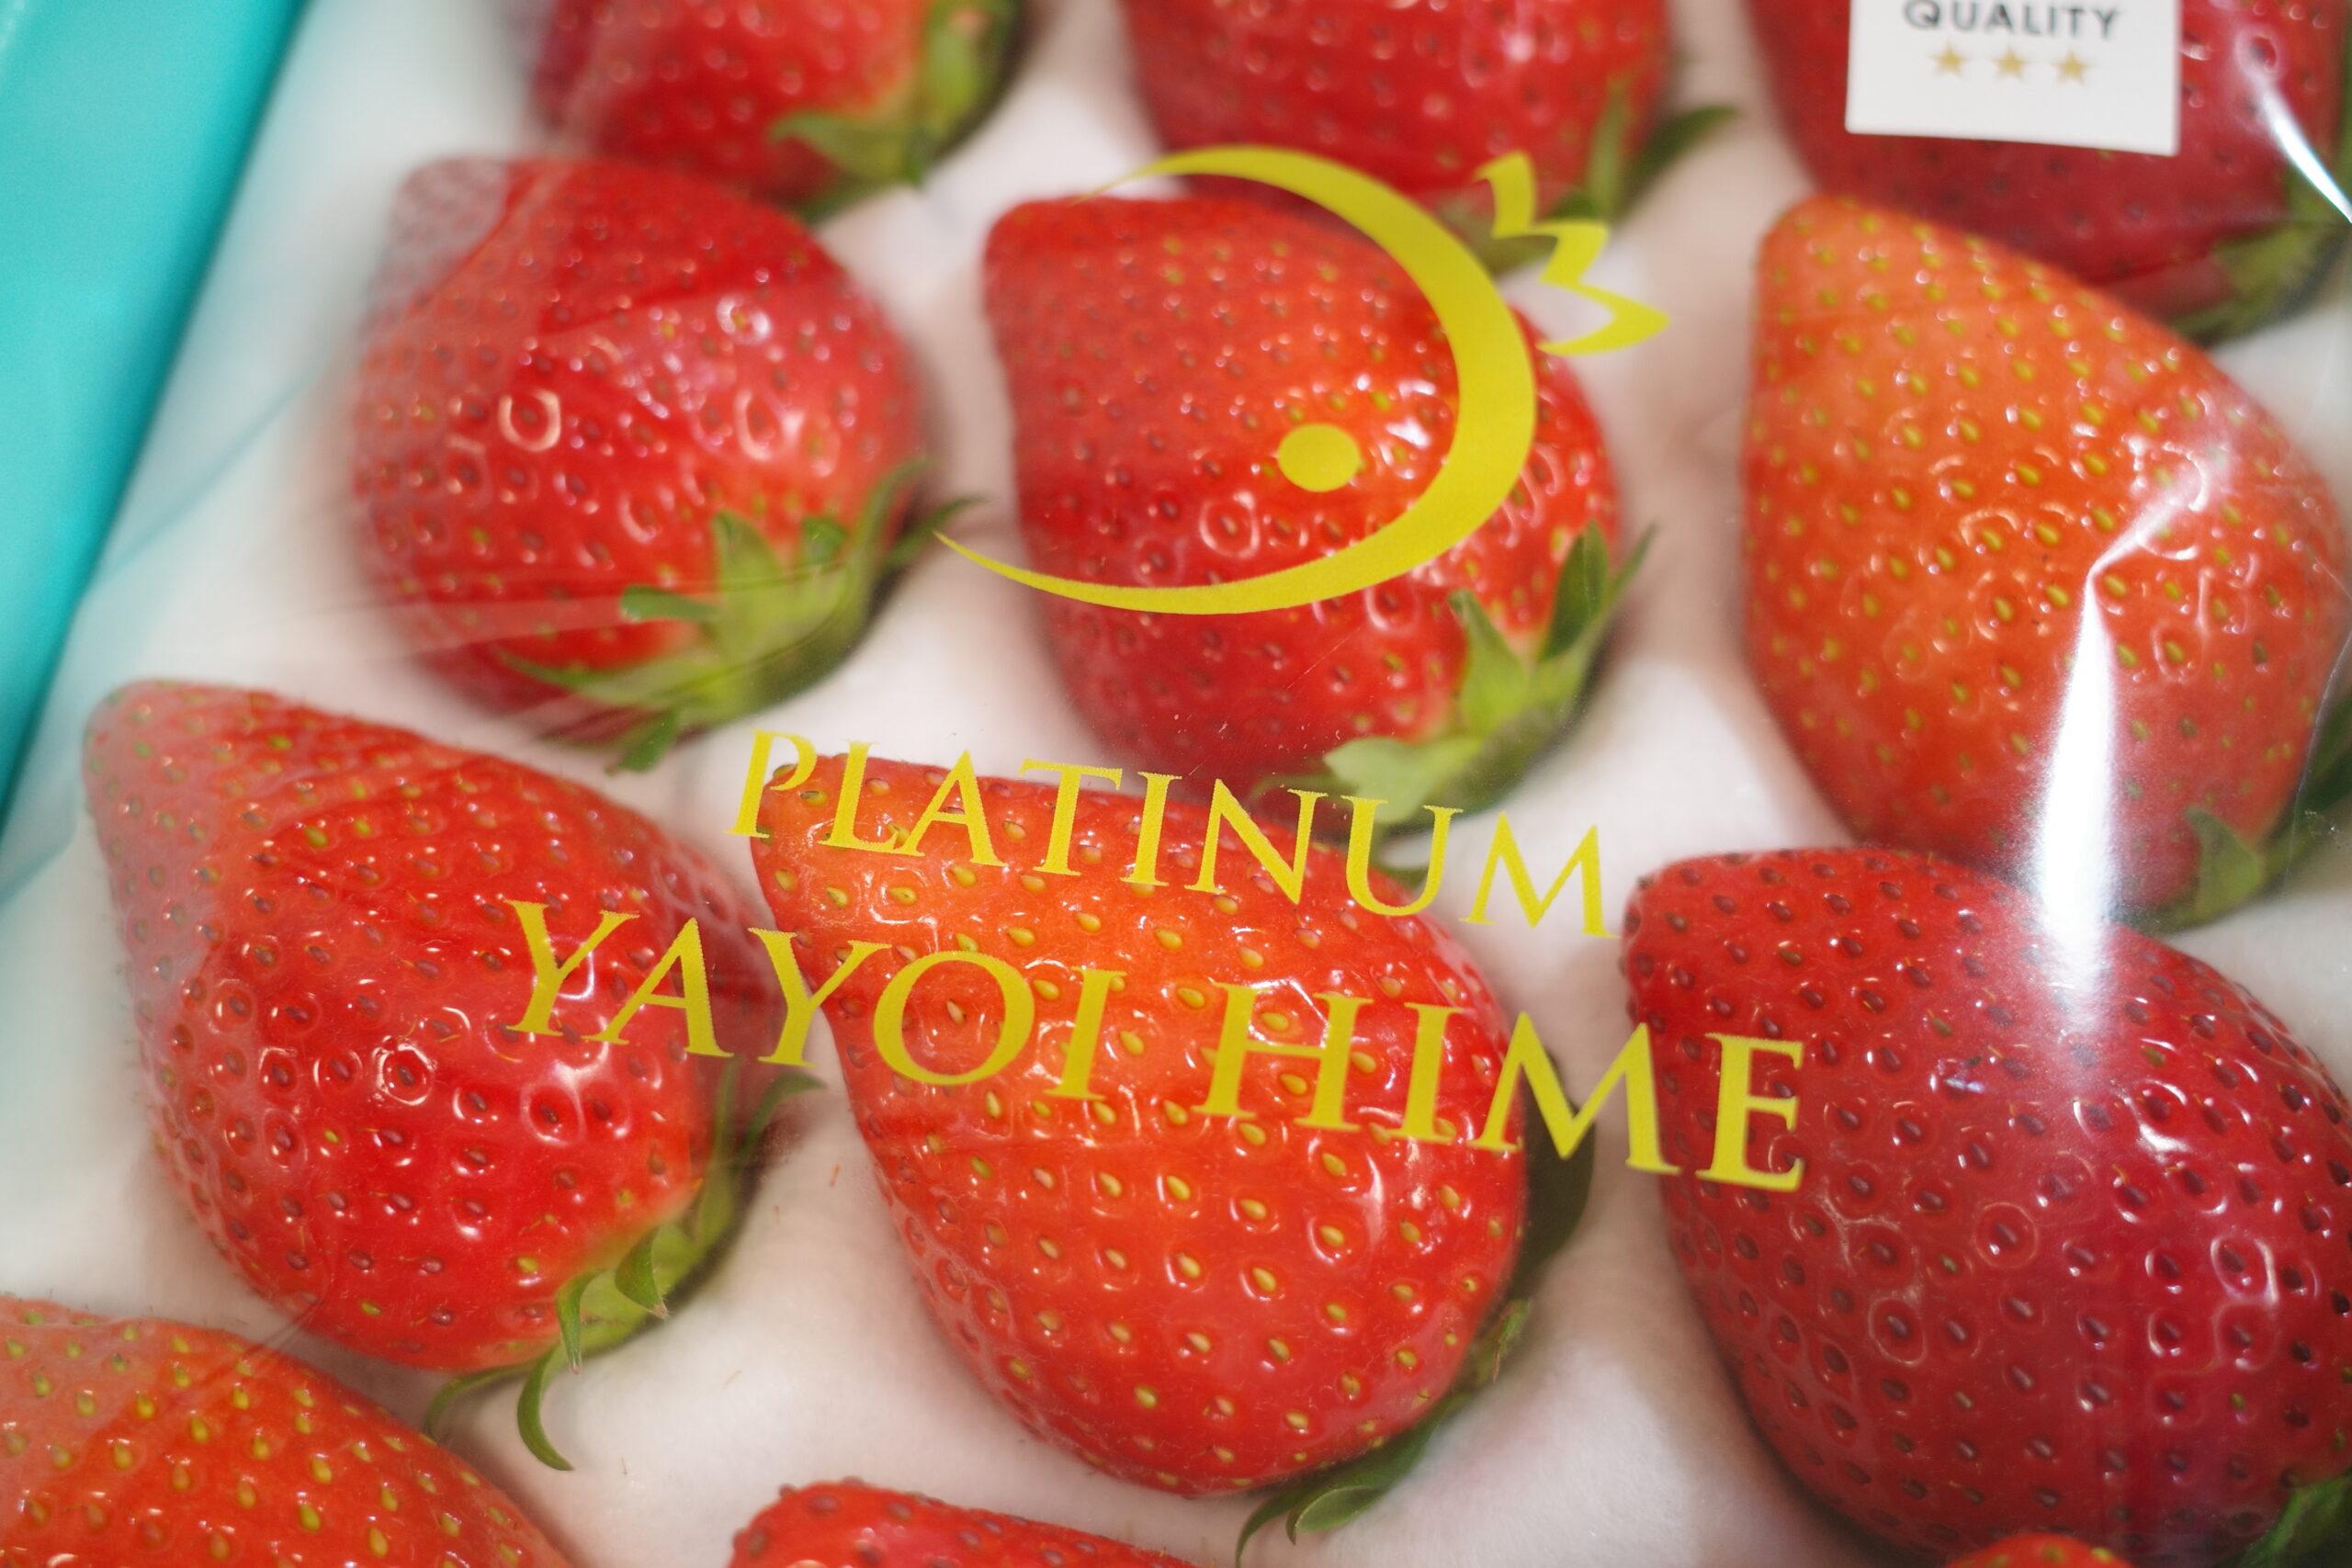 nakano.strawberryfarm